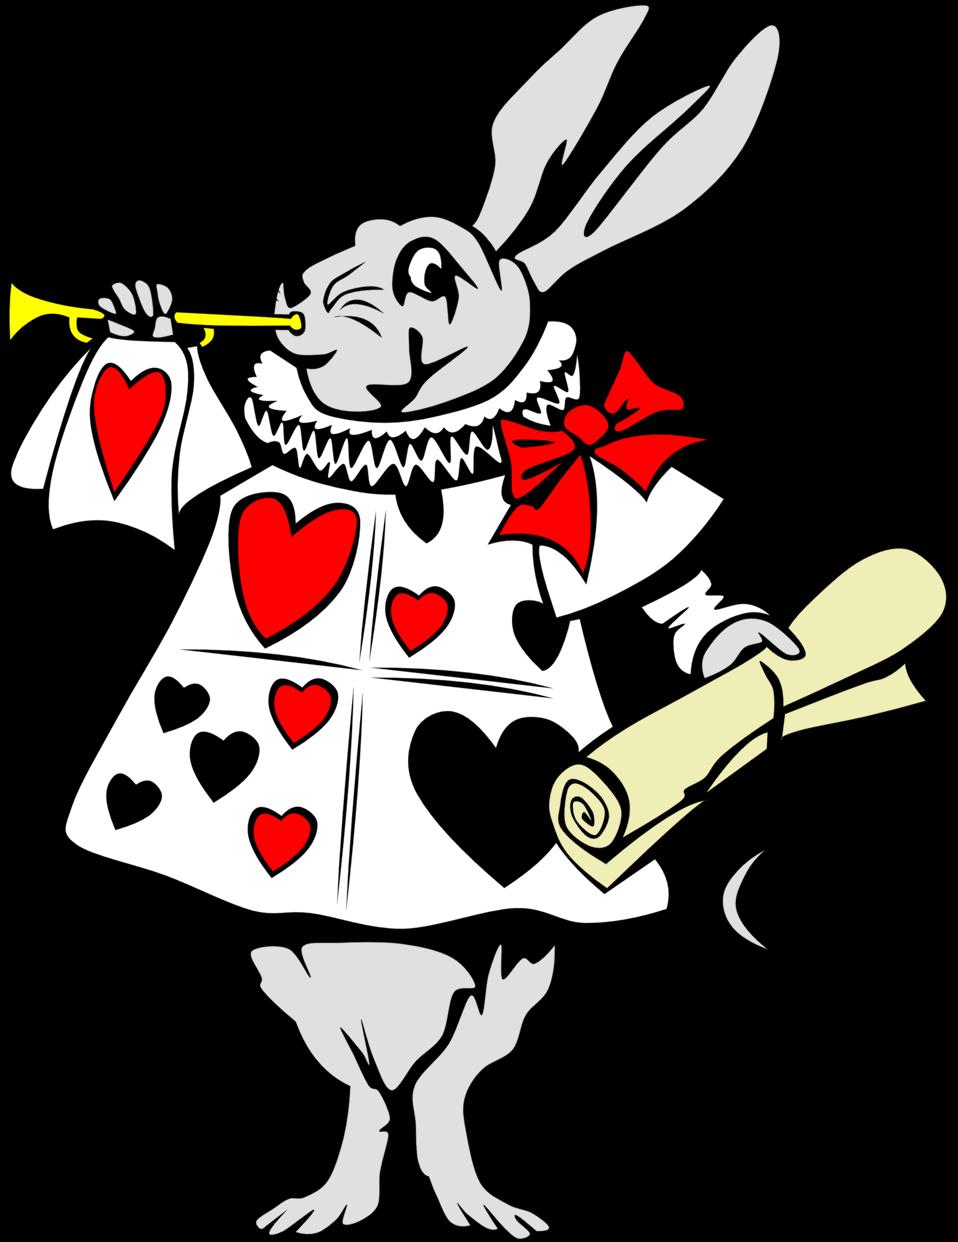 Rabbit from Alice in Wonderland